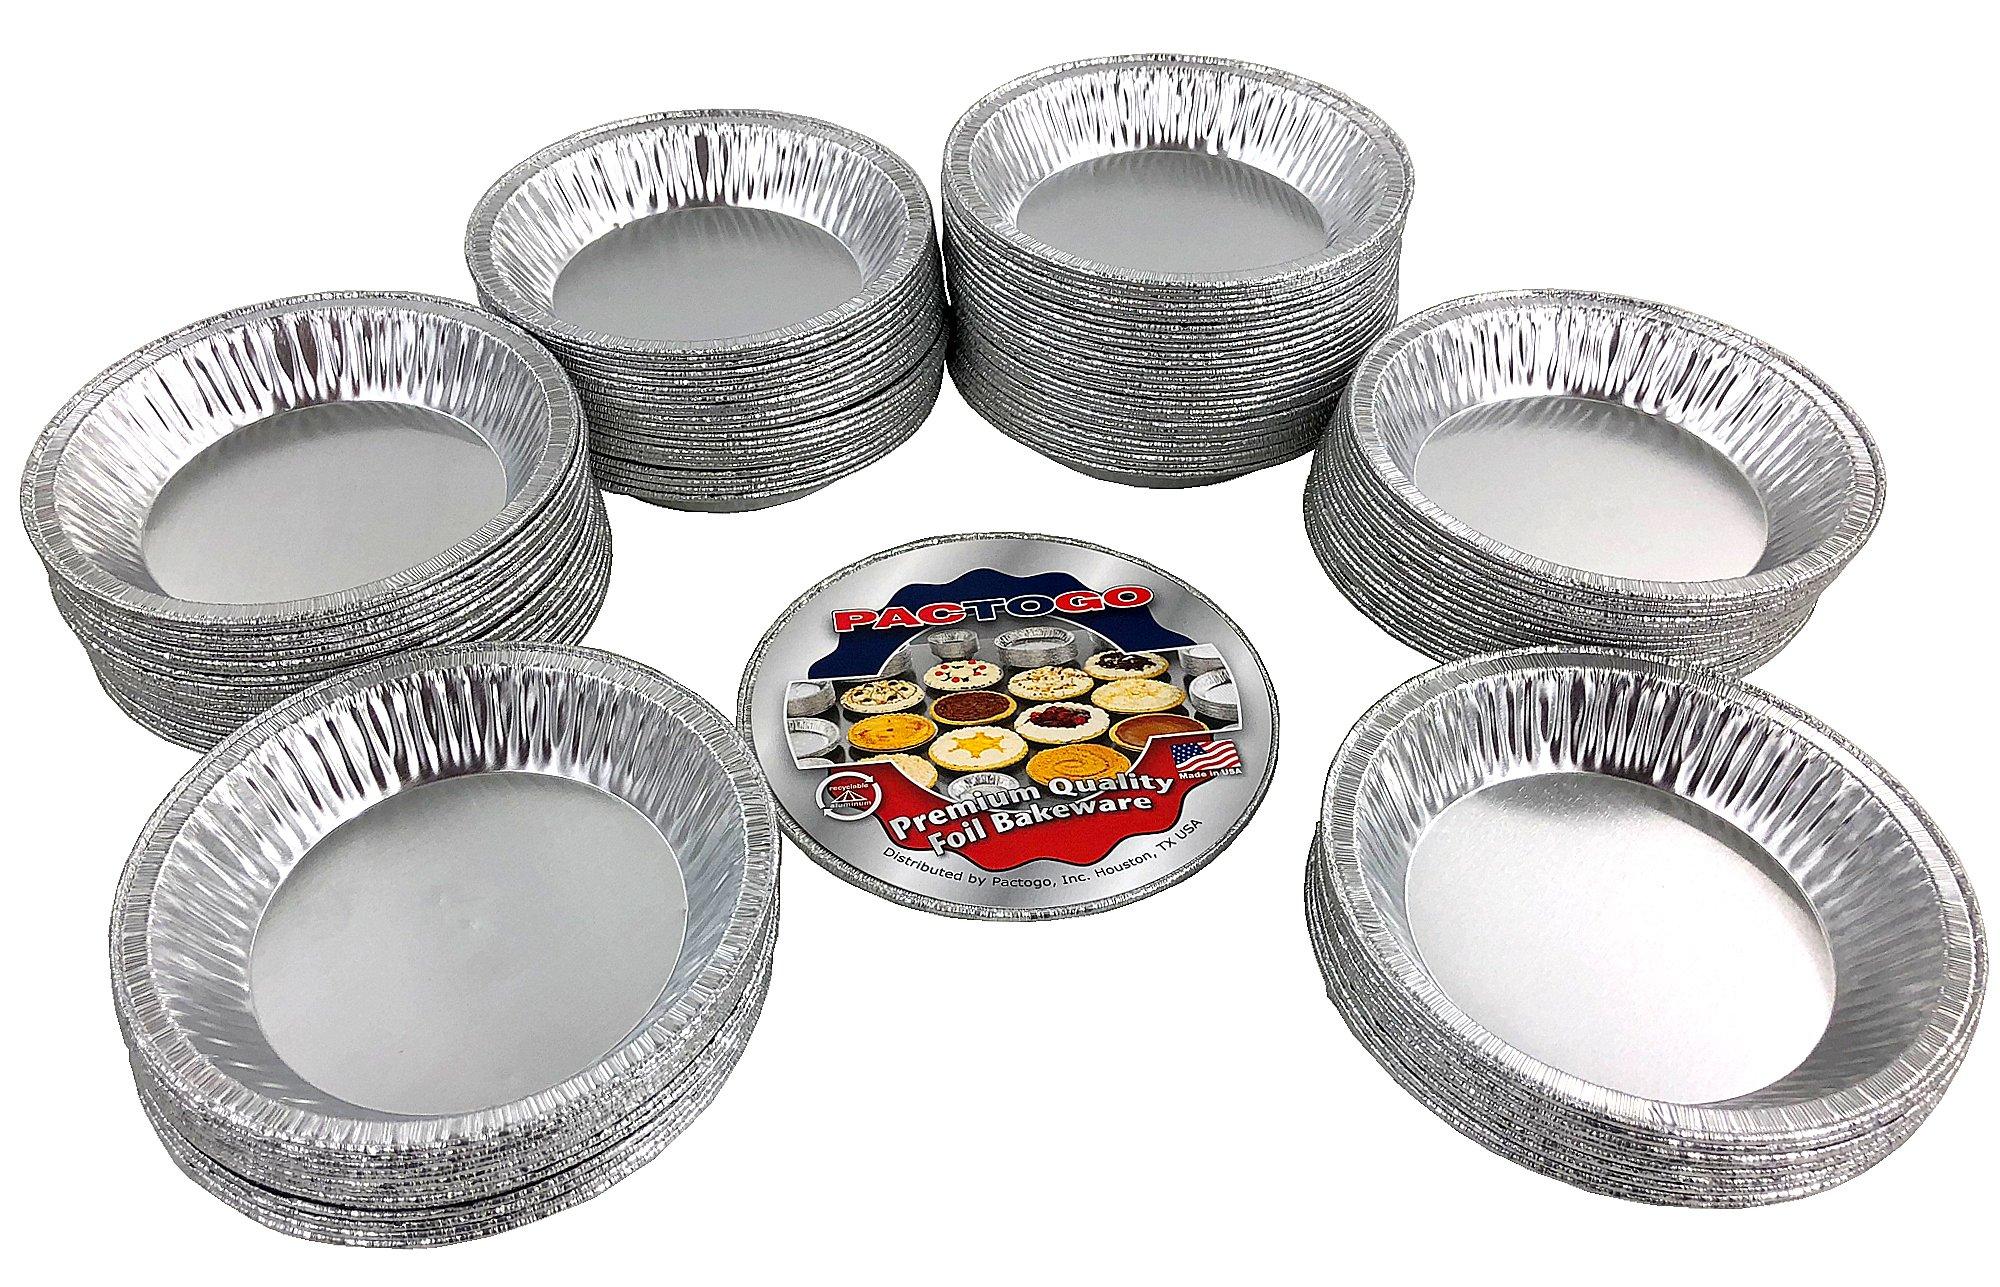 Pactogo 4 1/2'' Foil Tart Pan 7/8'' Deep - Mini Baking Pie Tins (Pack of 500) by PACTOGO (Image #2)